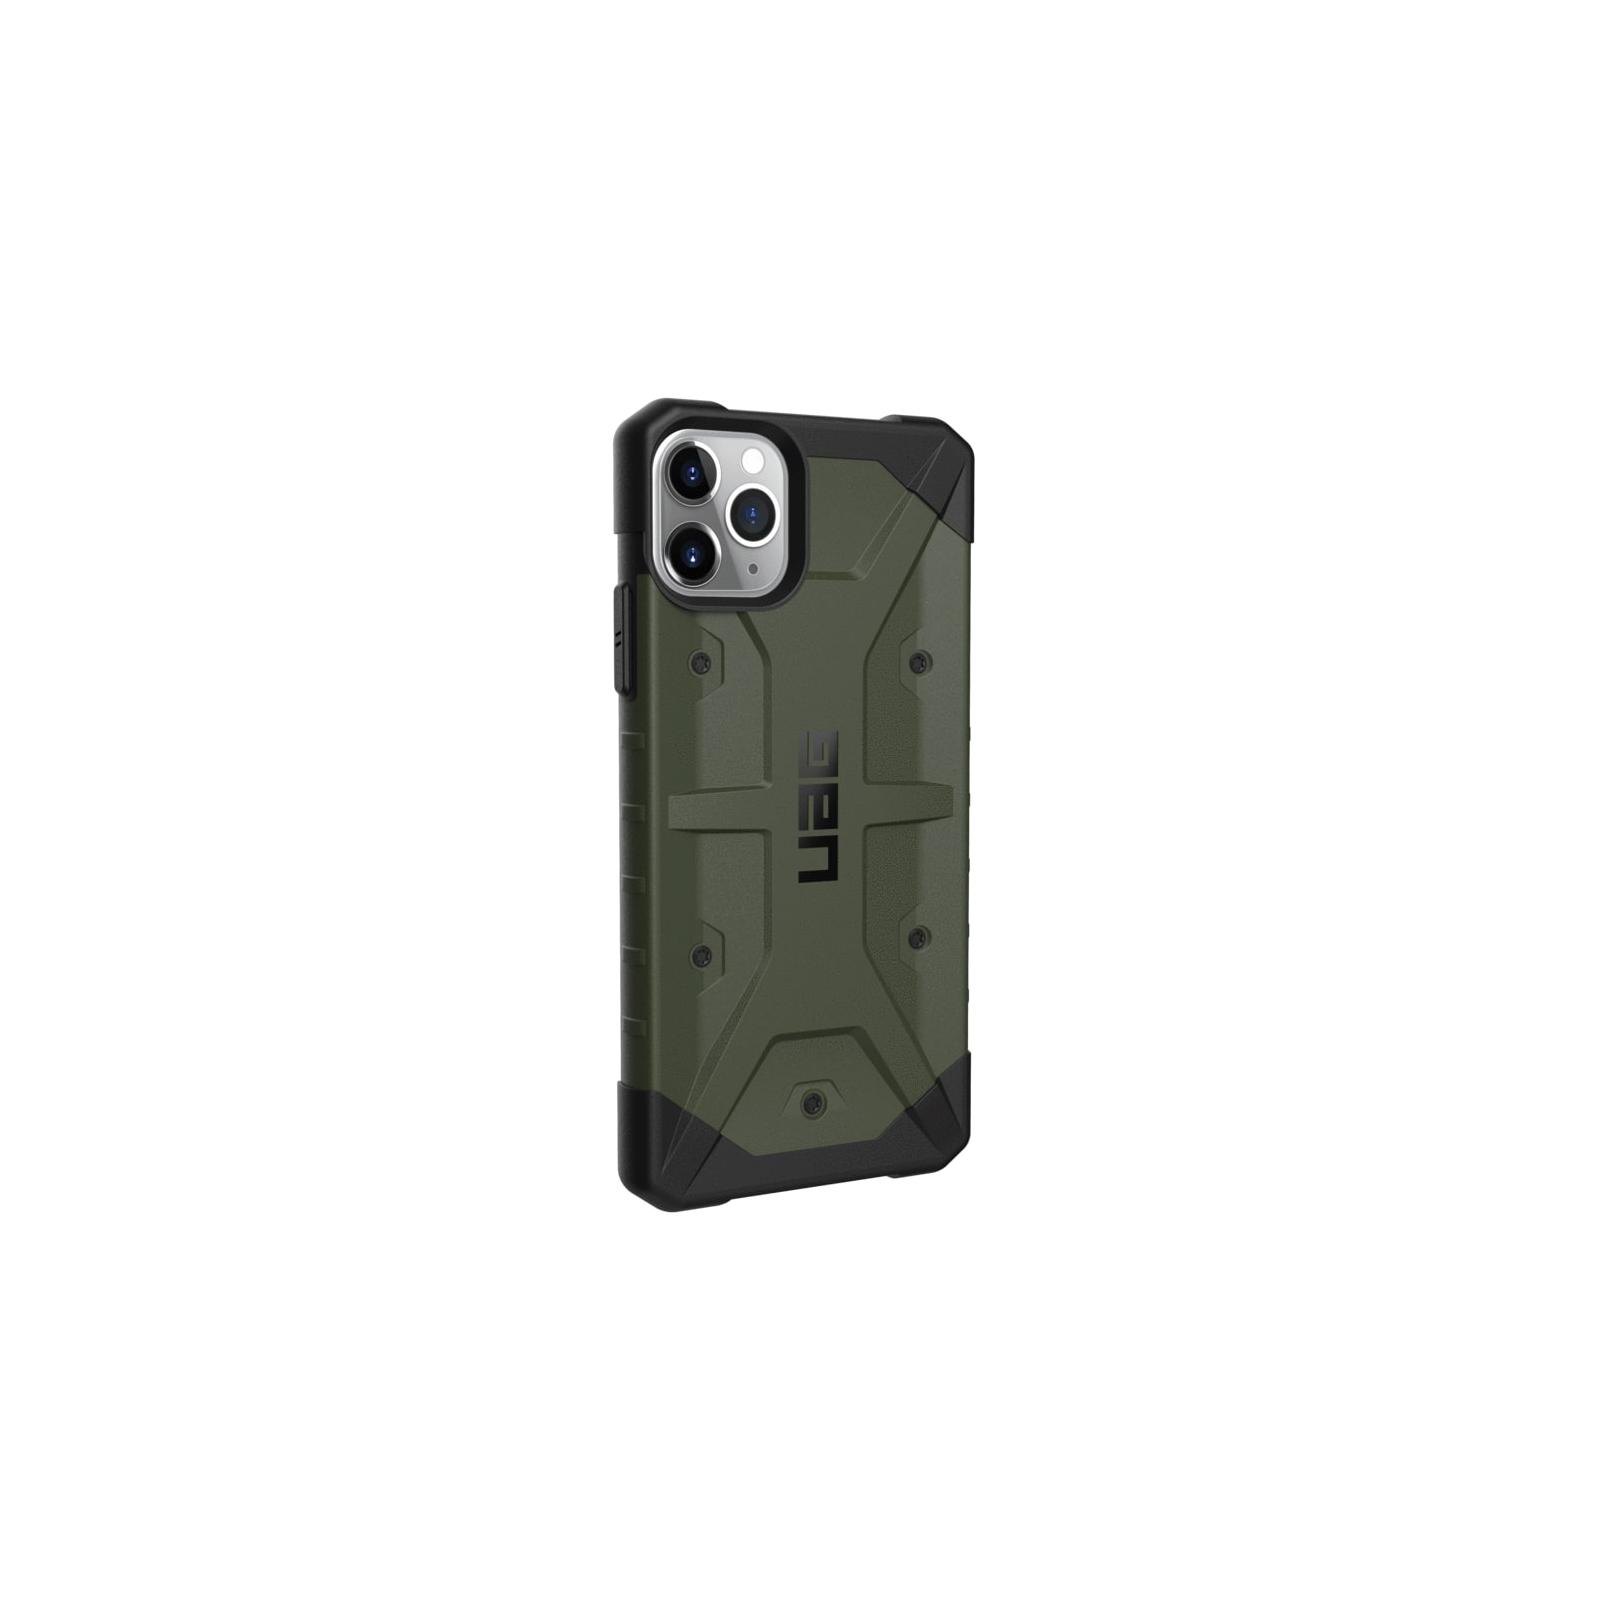 Чехол для моб. телефона Uag iPhone 11 Pro Max Pathfinder, Slate (111727115454) изображение 3